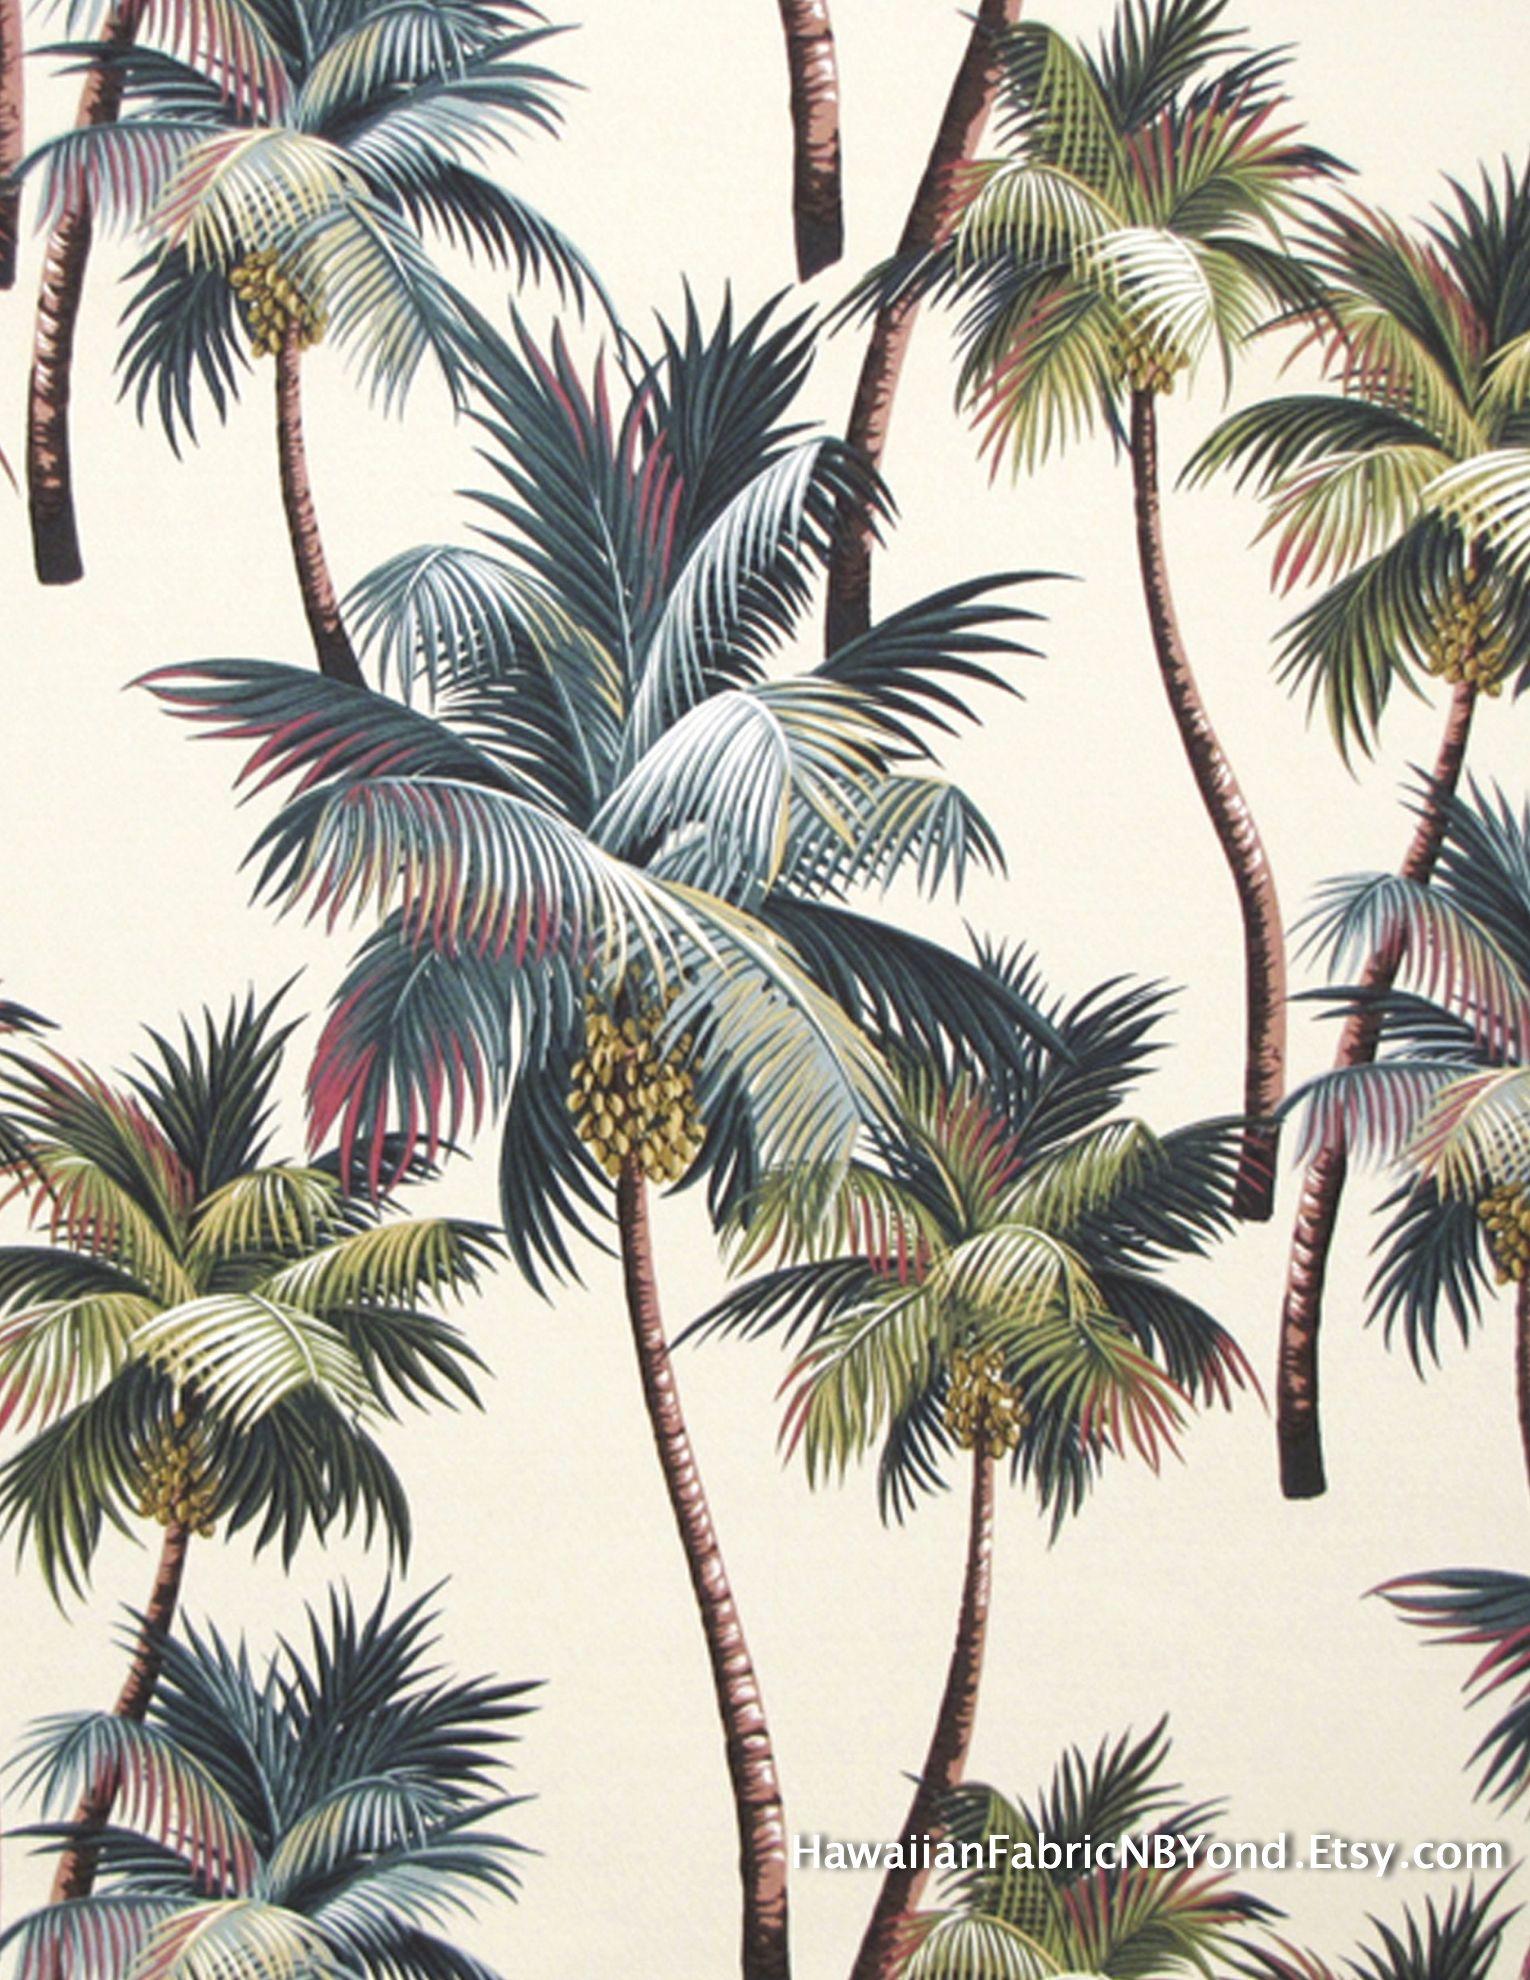 Hawaiian upholstery fabric palmtree home homedecor polster tapisserie tropicalhome tissu stoff